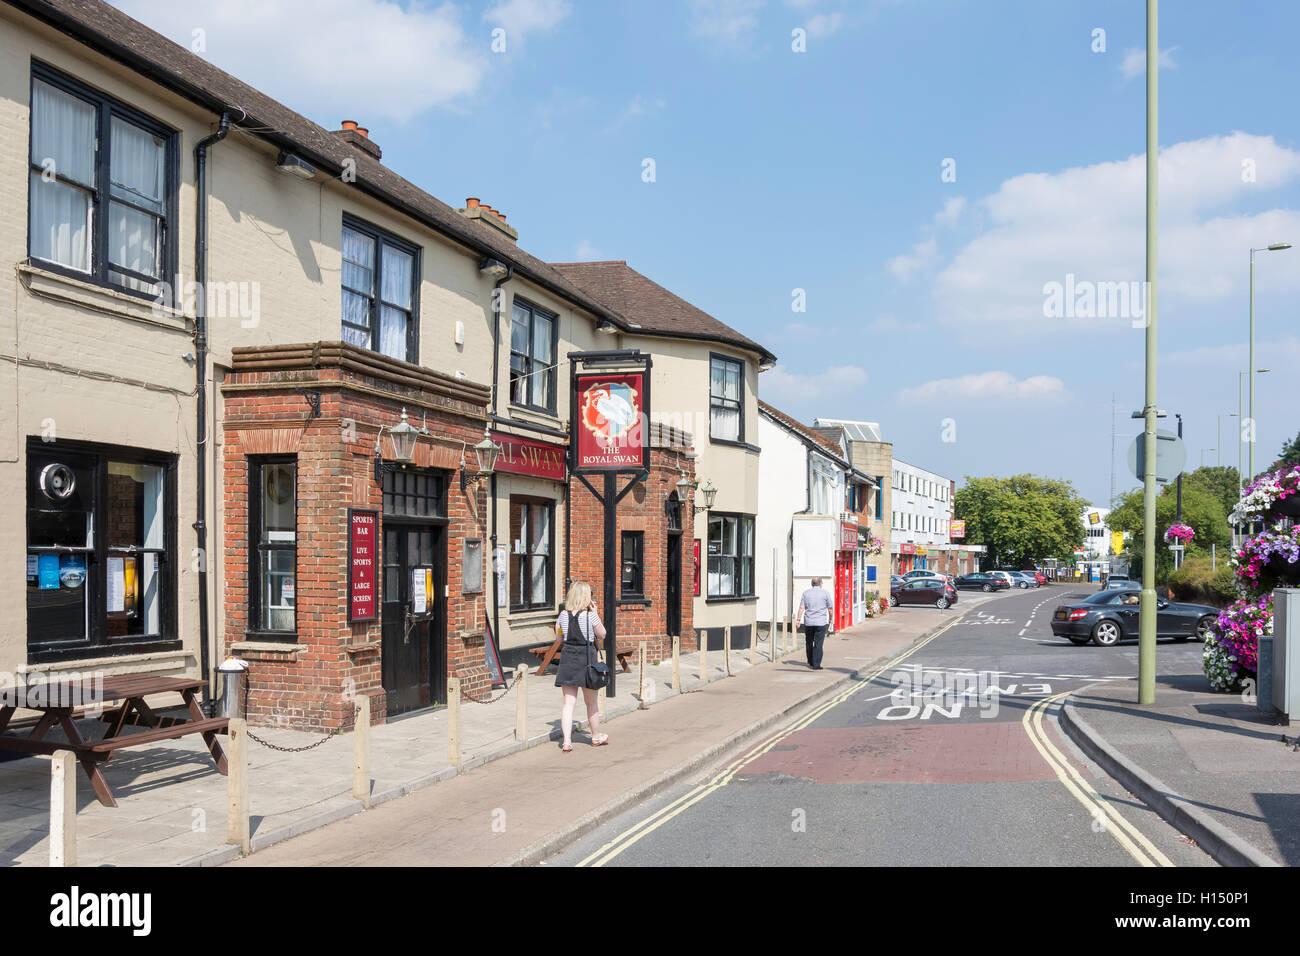 The Royal Swan Pub, London Road, Blackwater, Hampshire, England, United Kingdom - Stock Image